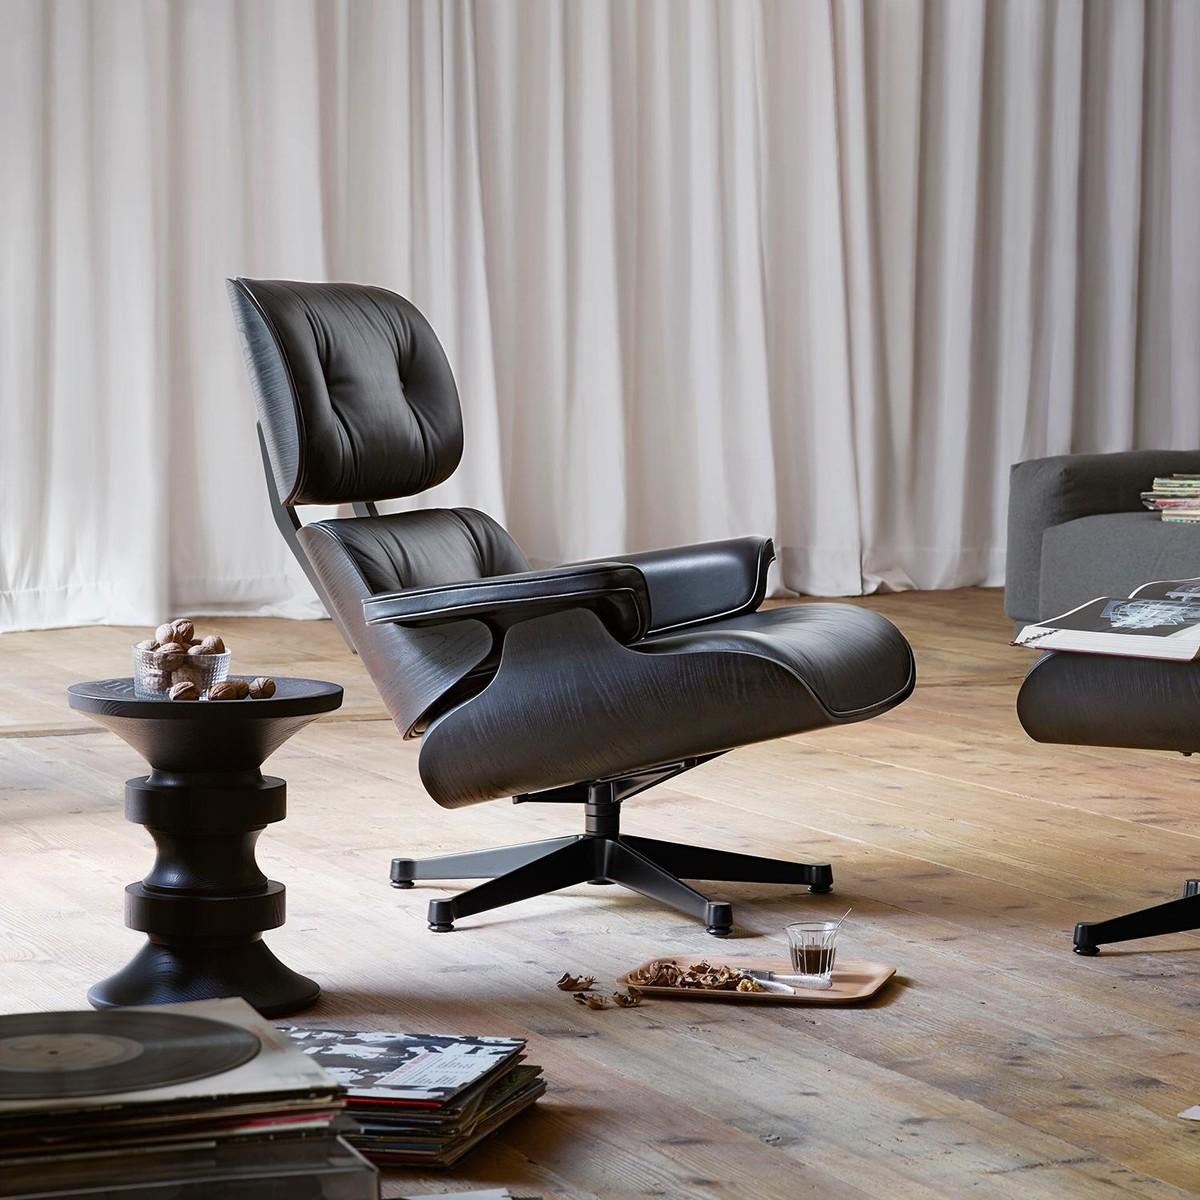 eames lounge chair xl nieuwe maat draaistoel vitra. Black Bedroom Furniture Sets. Home Design Ideas